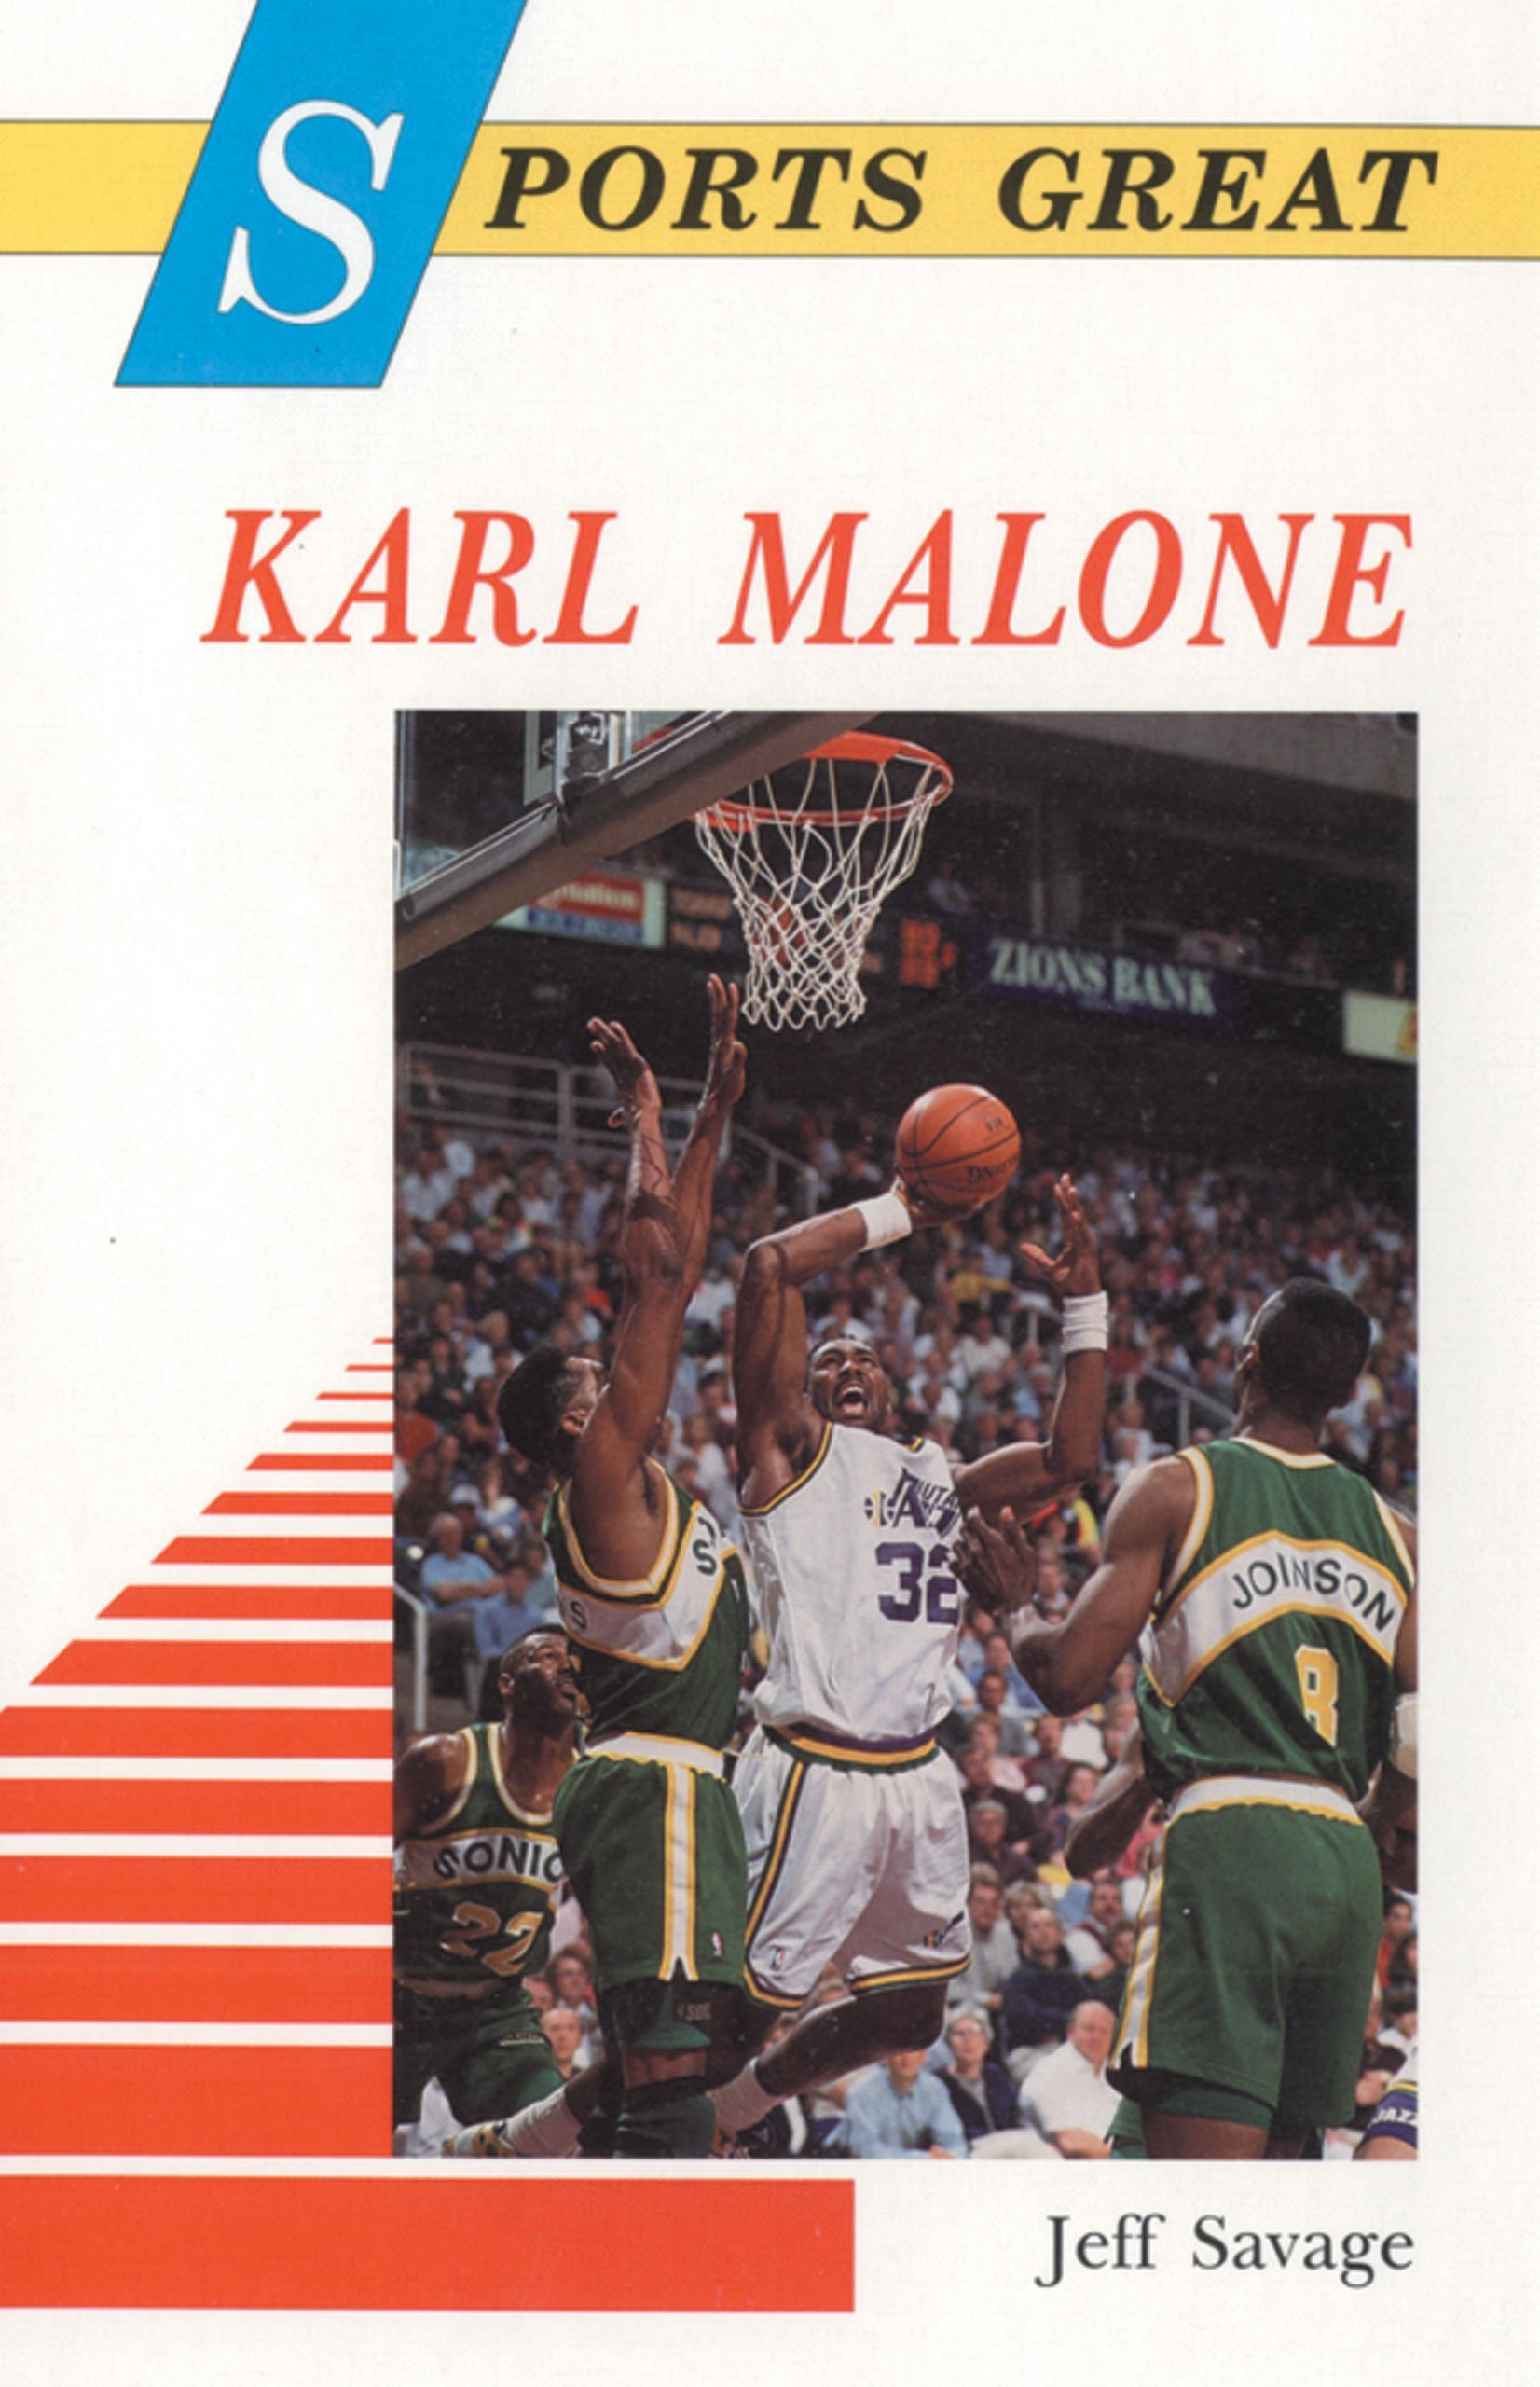 Sports Great Karl Malone (Sports Great Books)